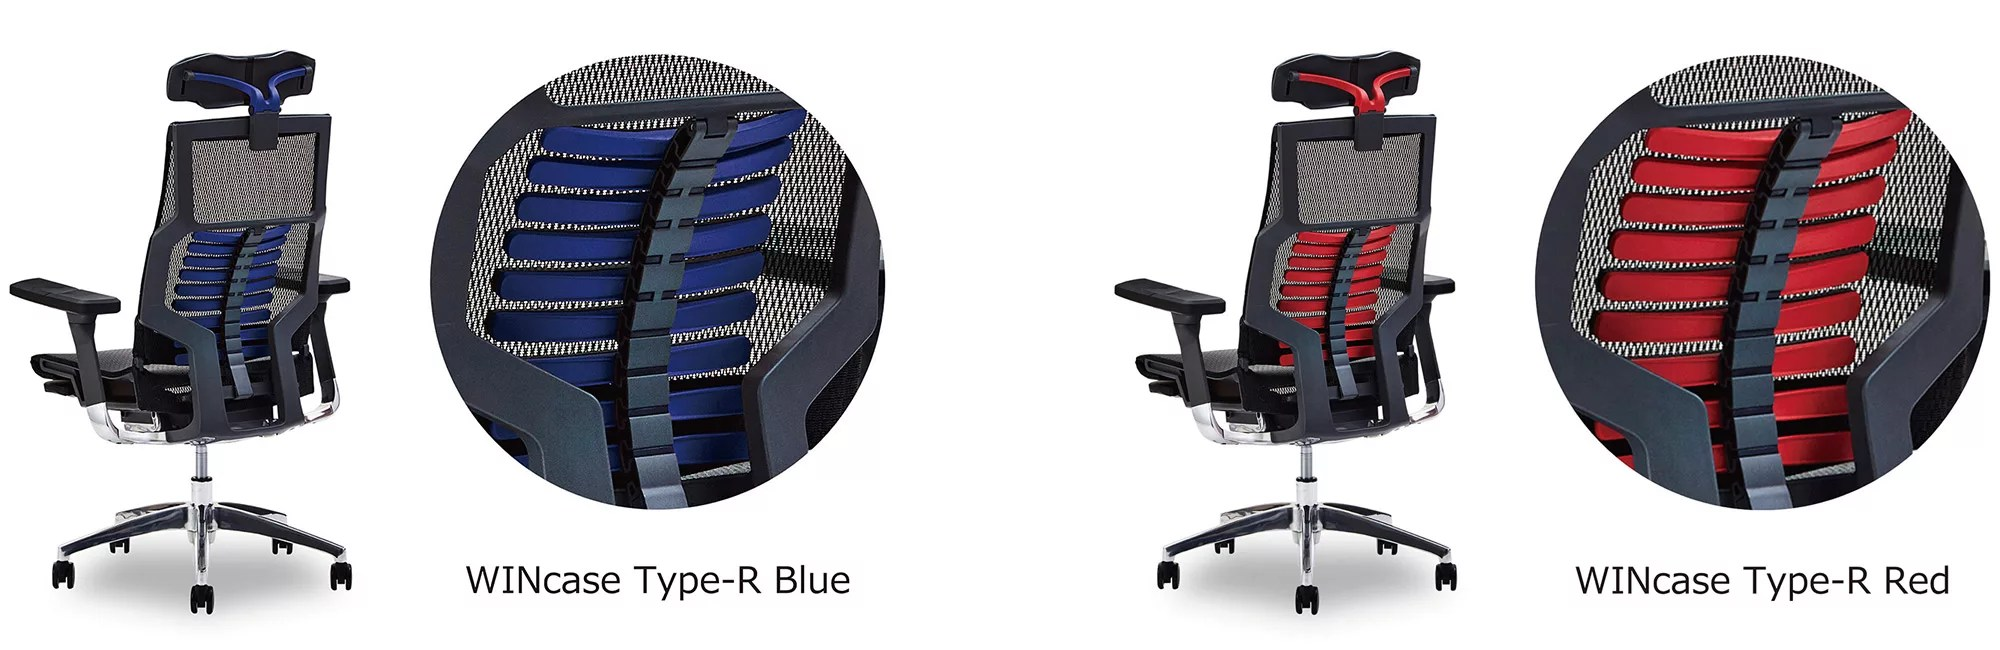 Type-R ブルー(左) レッド(右)